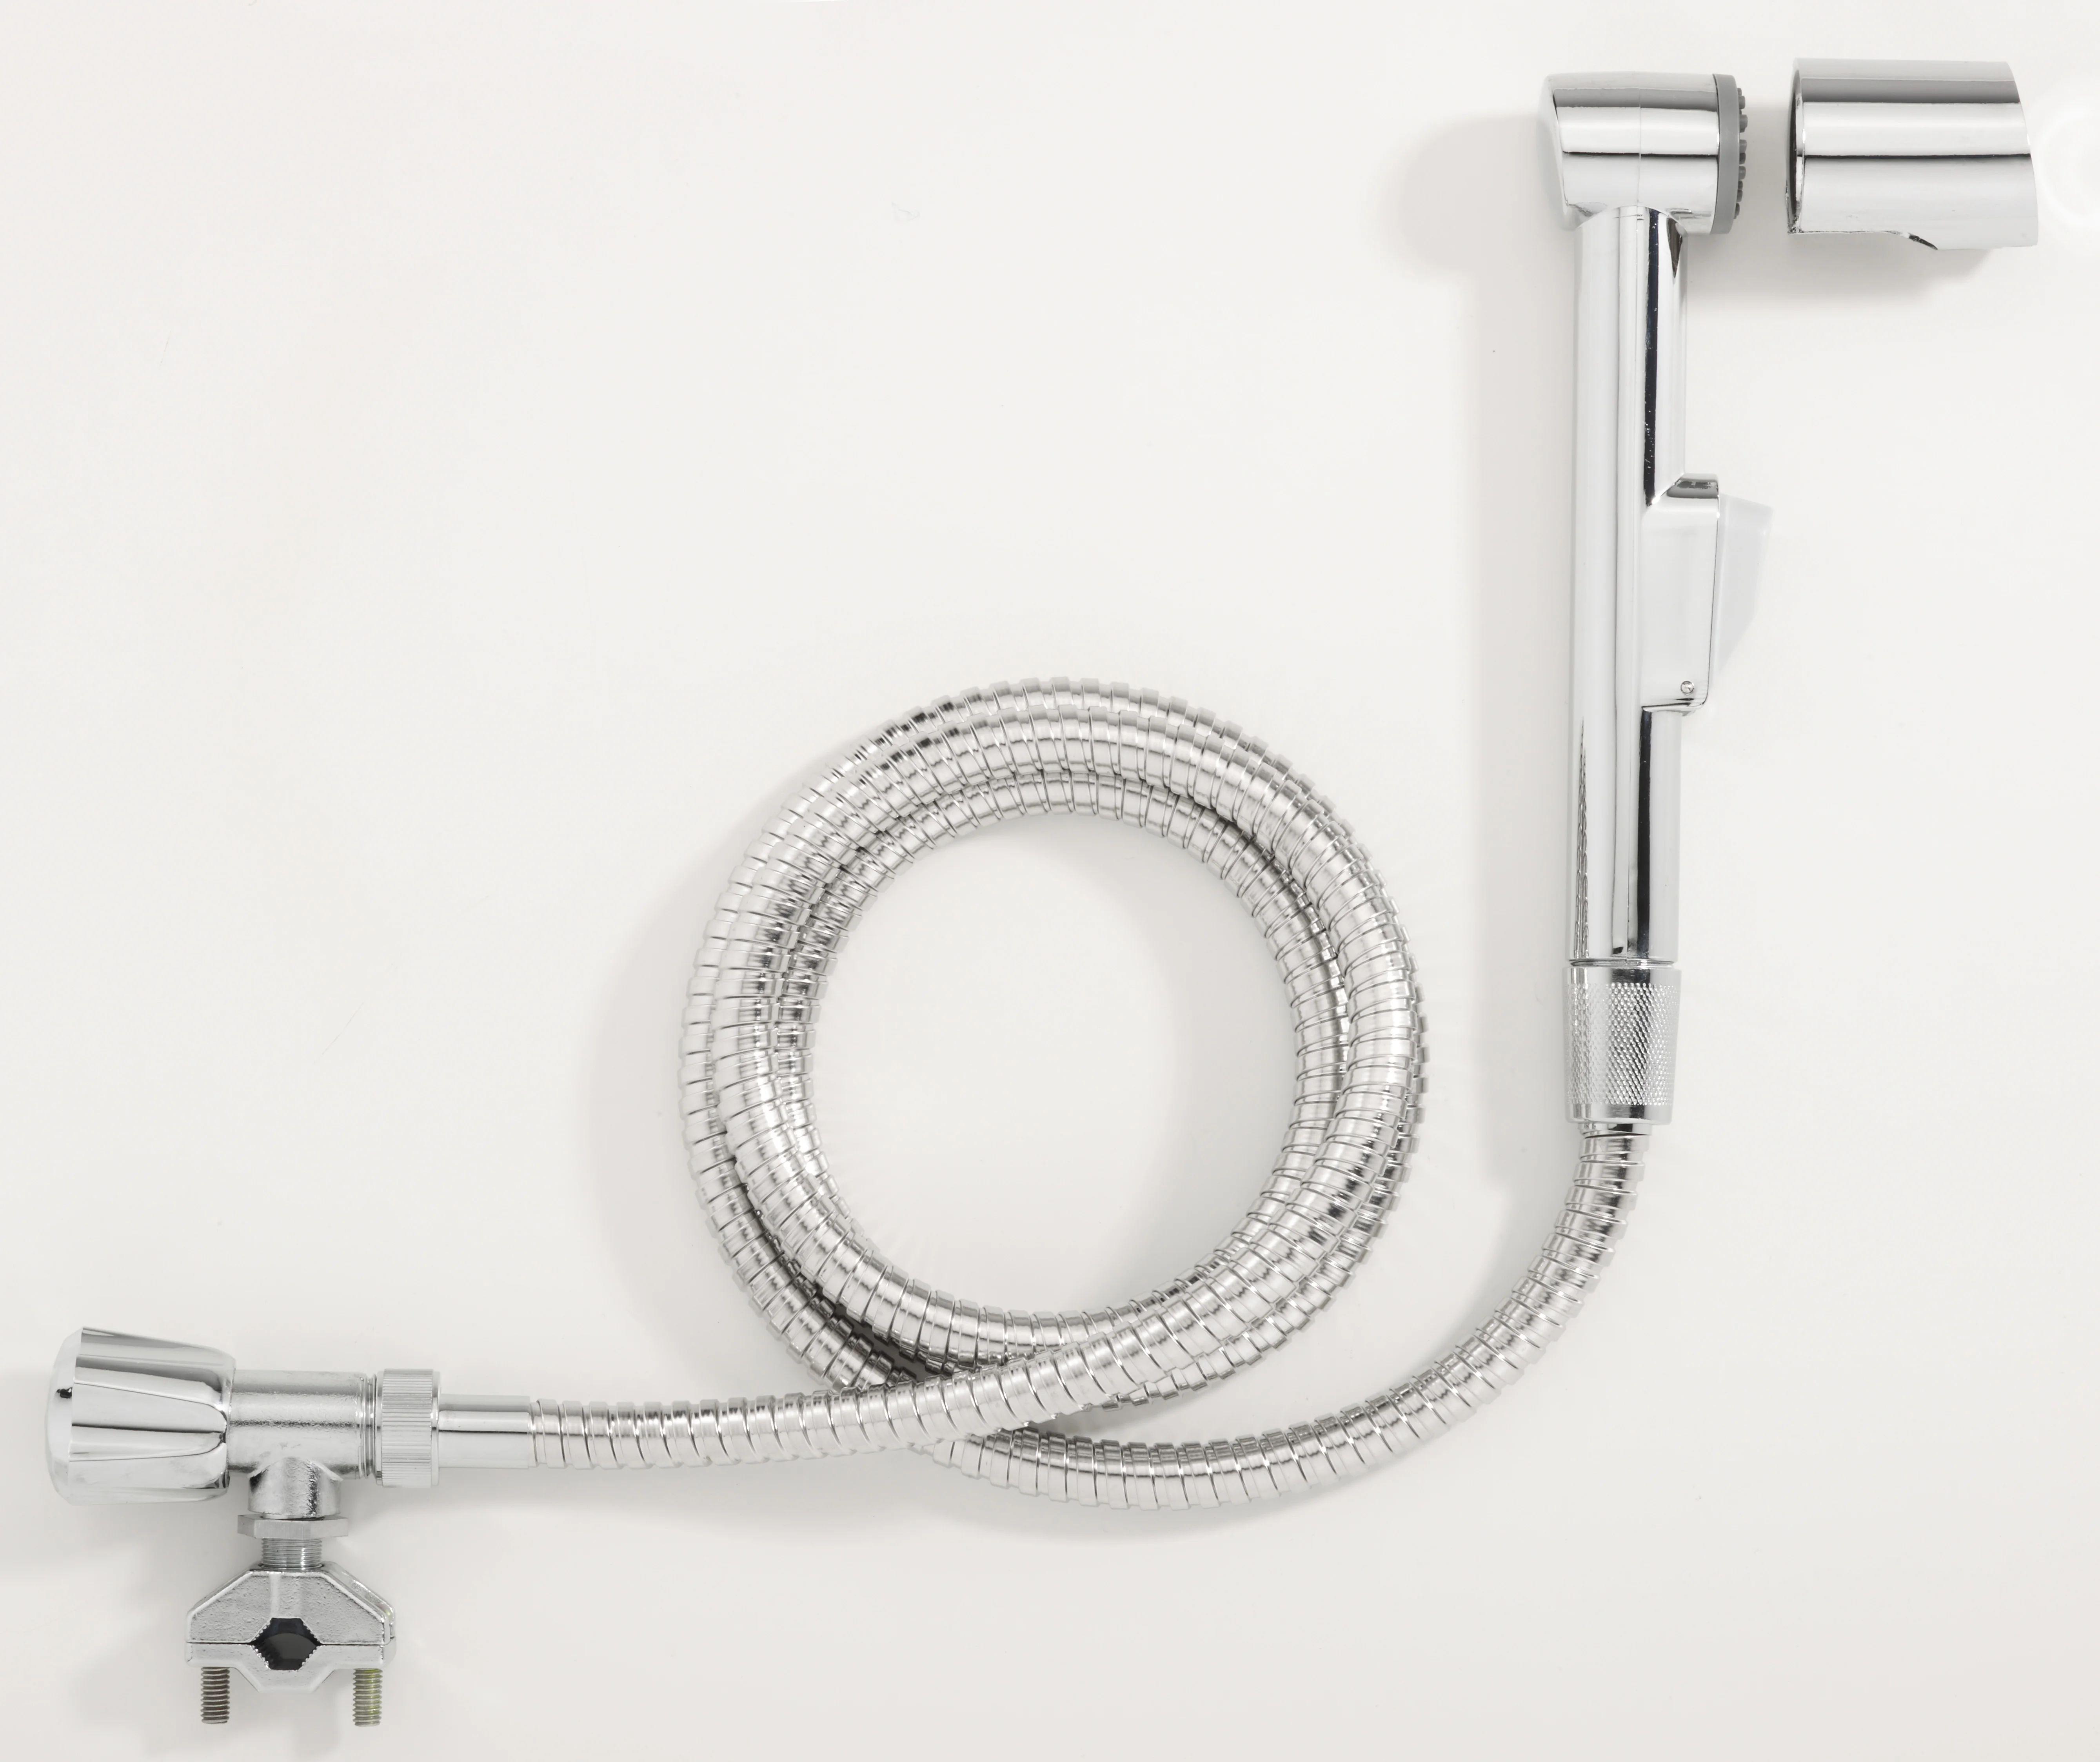 Kit Hygiene Auto Perceur Leroy Merlin